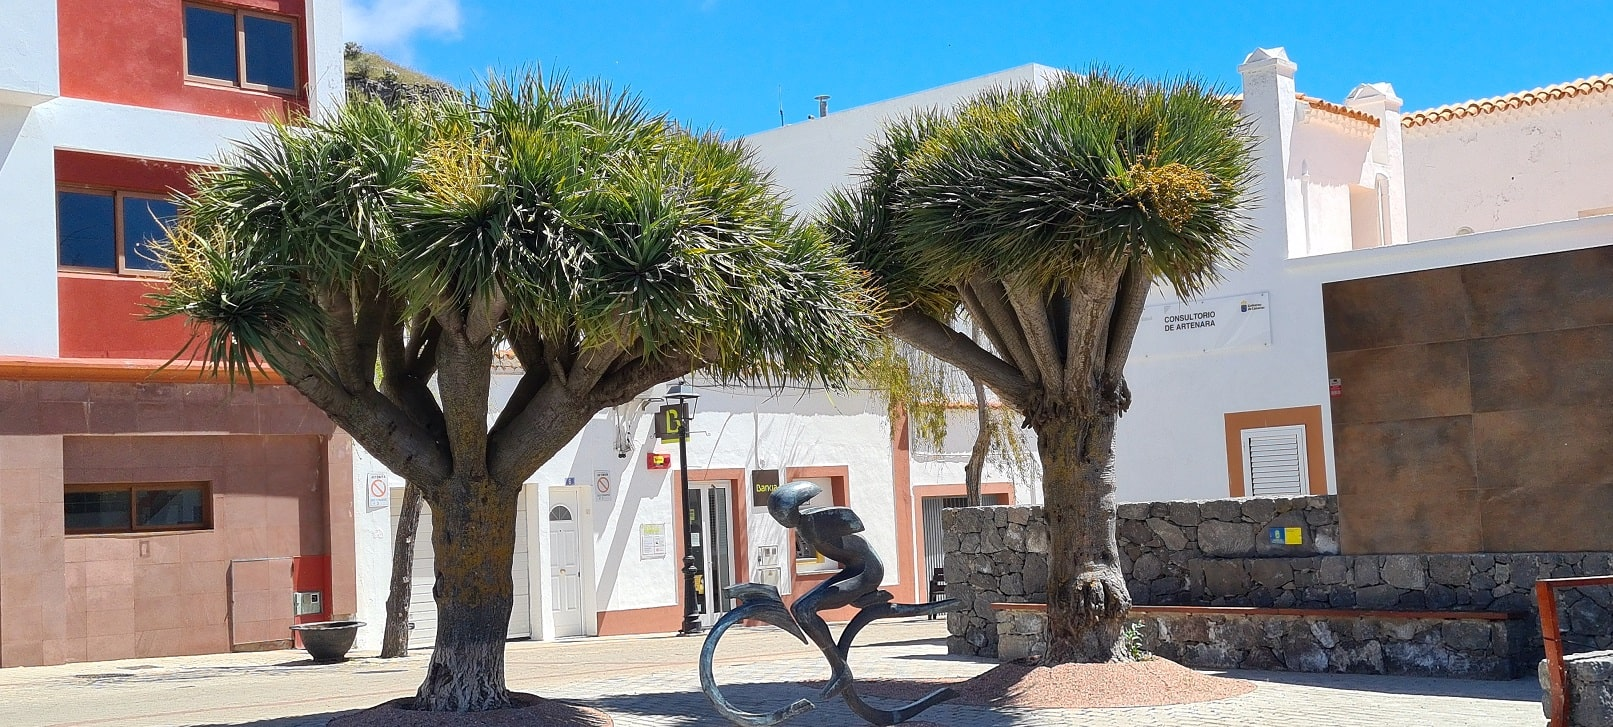 Gran Canaria - Radfahrerskulptur